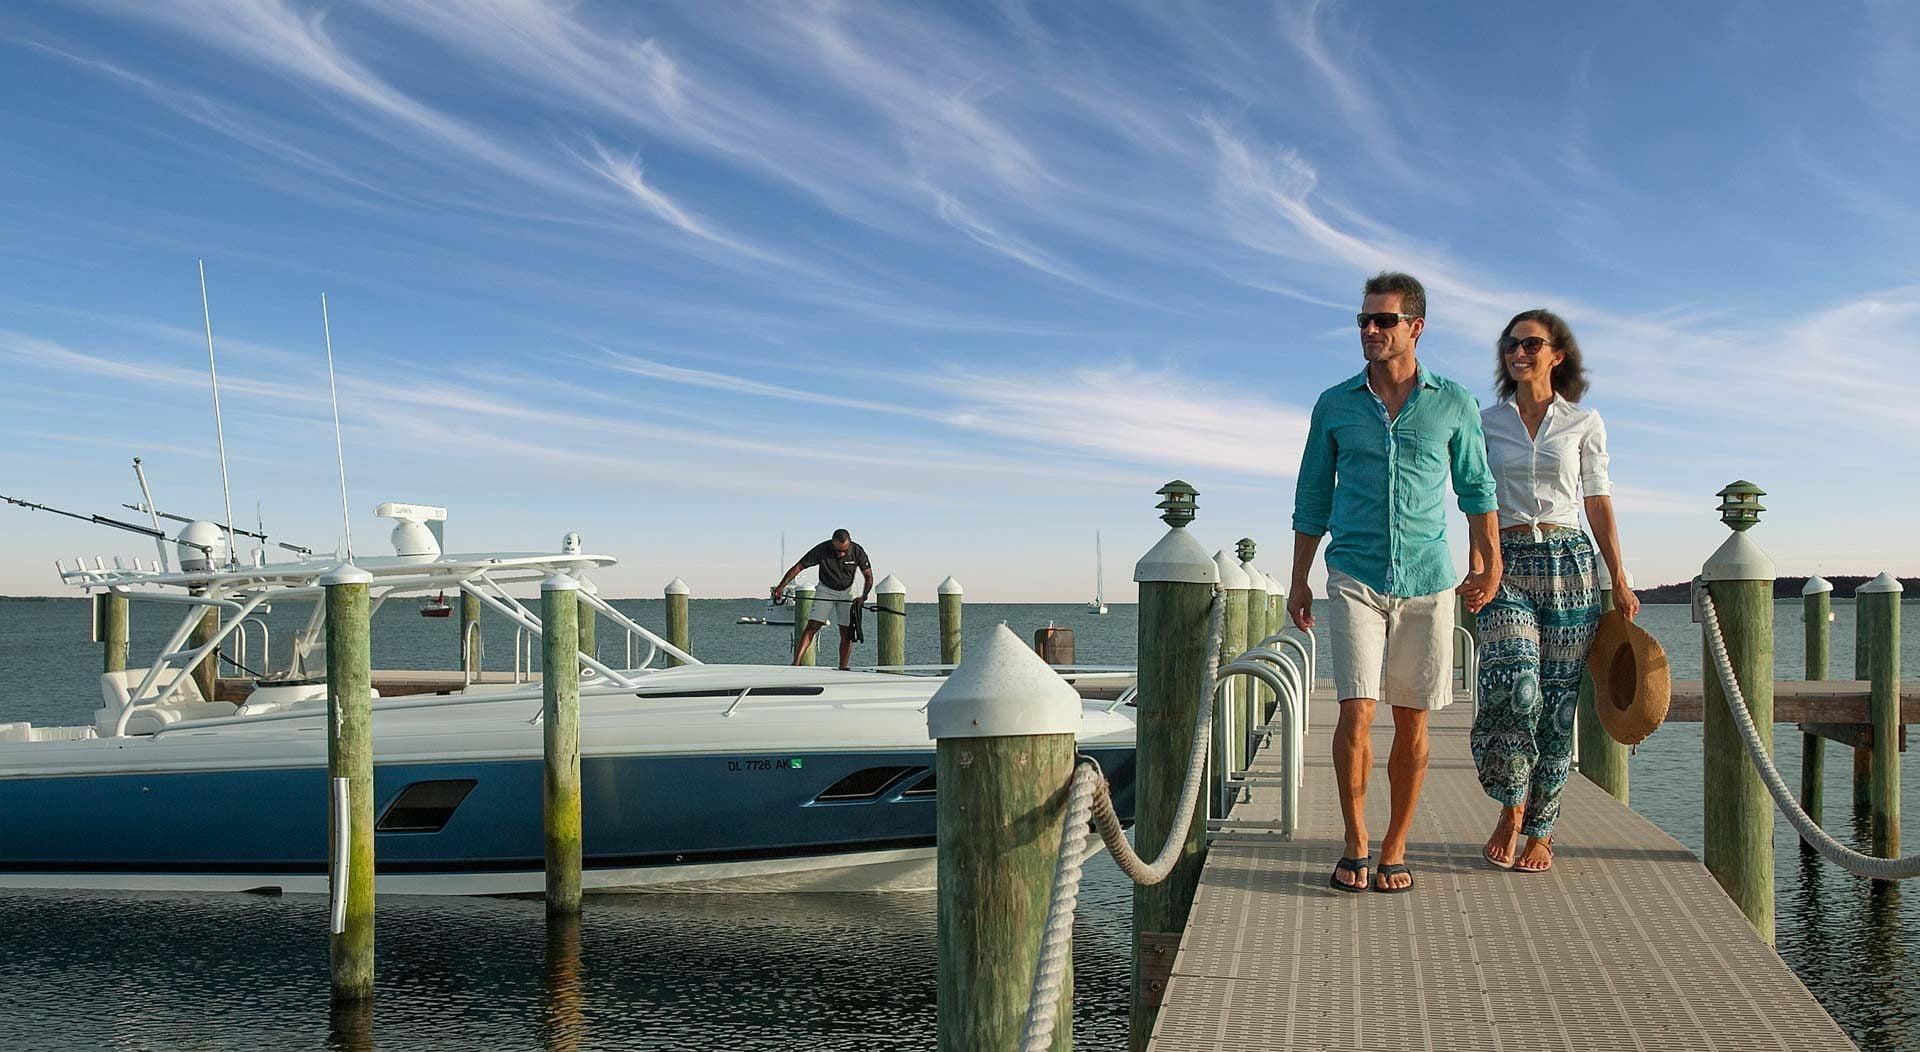 couple walking on dock away from boat towards shore